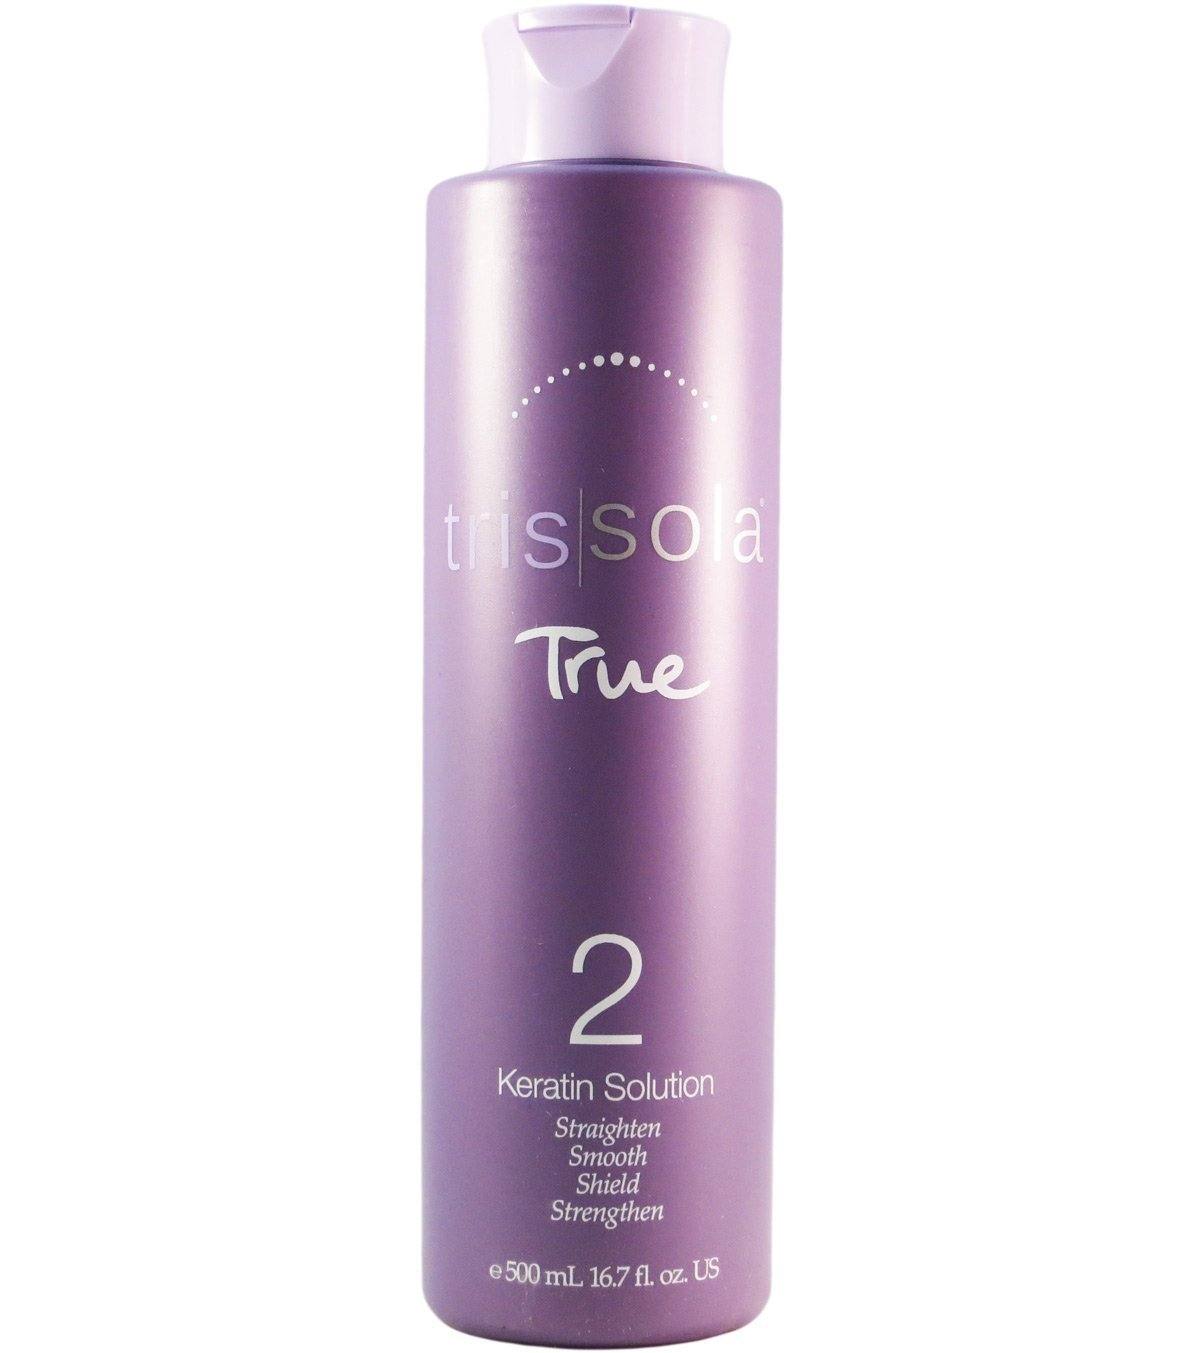 Trissola True Keratin Solution 16.7 oz-0